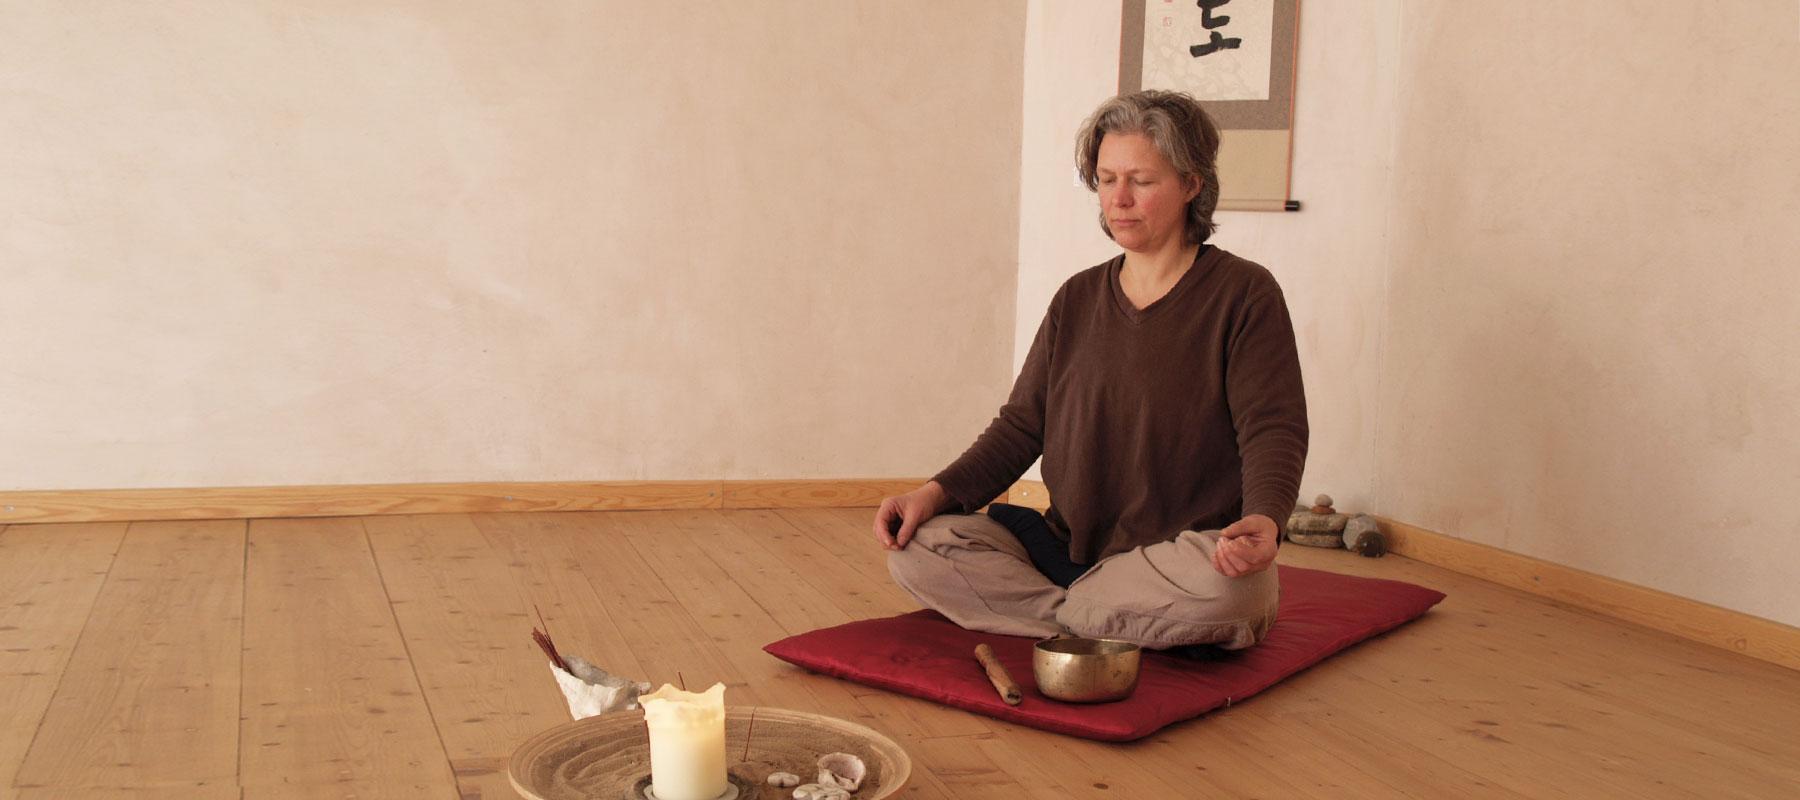 Shinson Hapkido St. Pauli Meditation